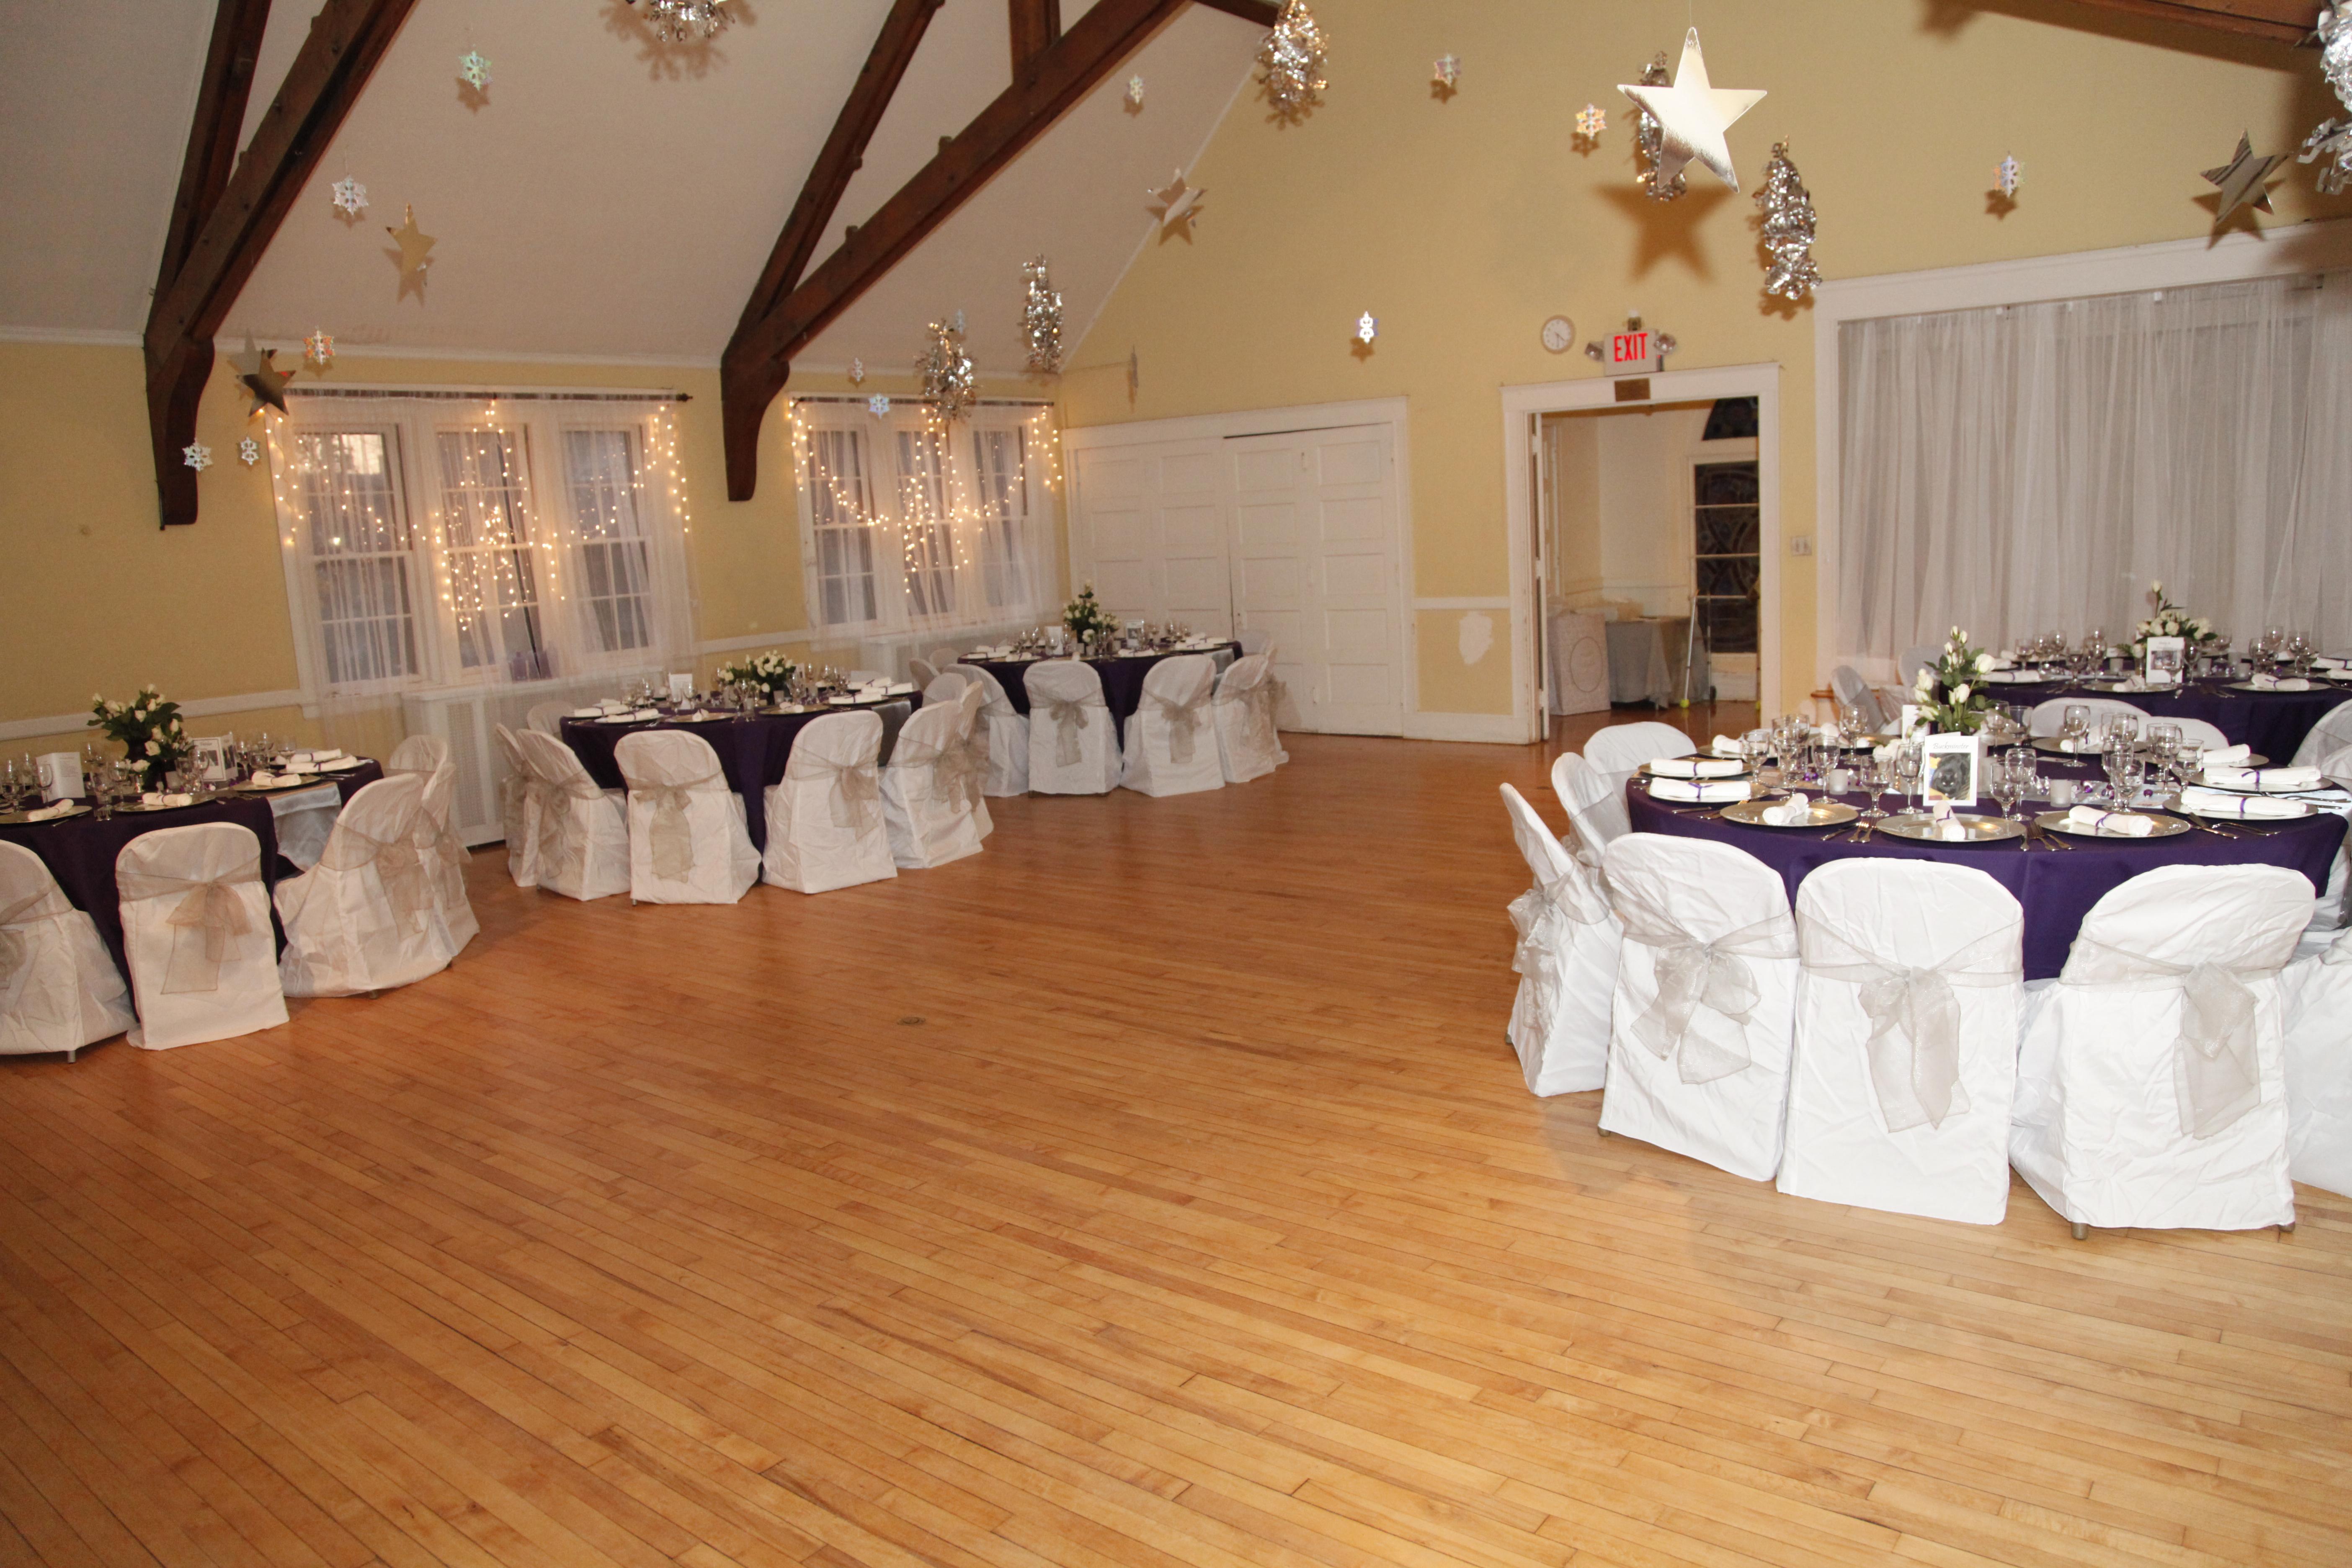 Amazing Purple Wedding Tables White Chair 5616 x 3744 · 6913 kB · jpeg